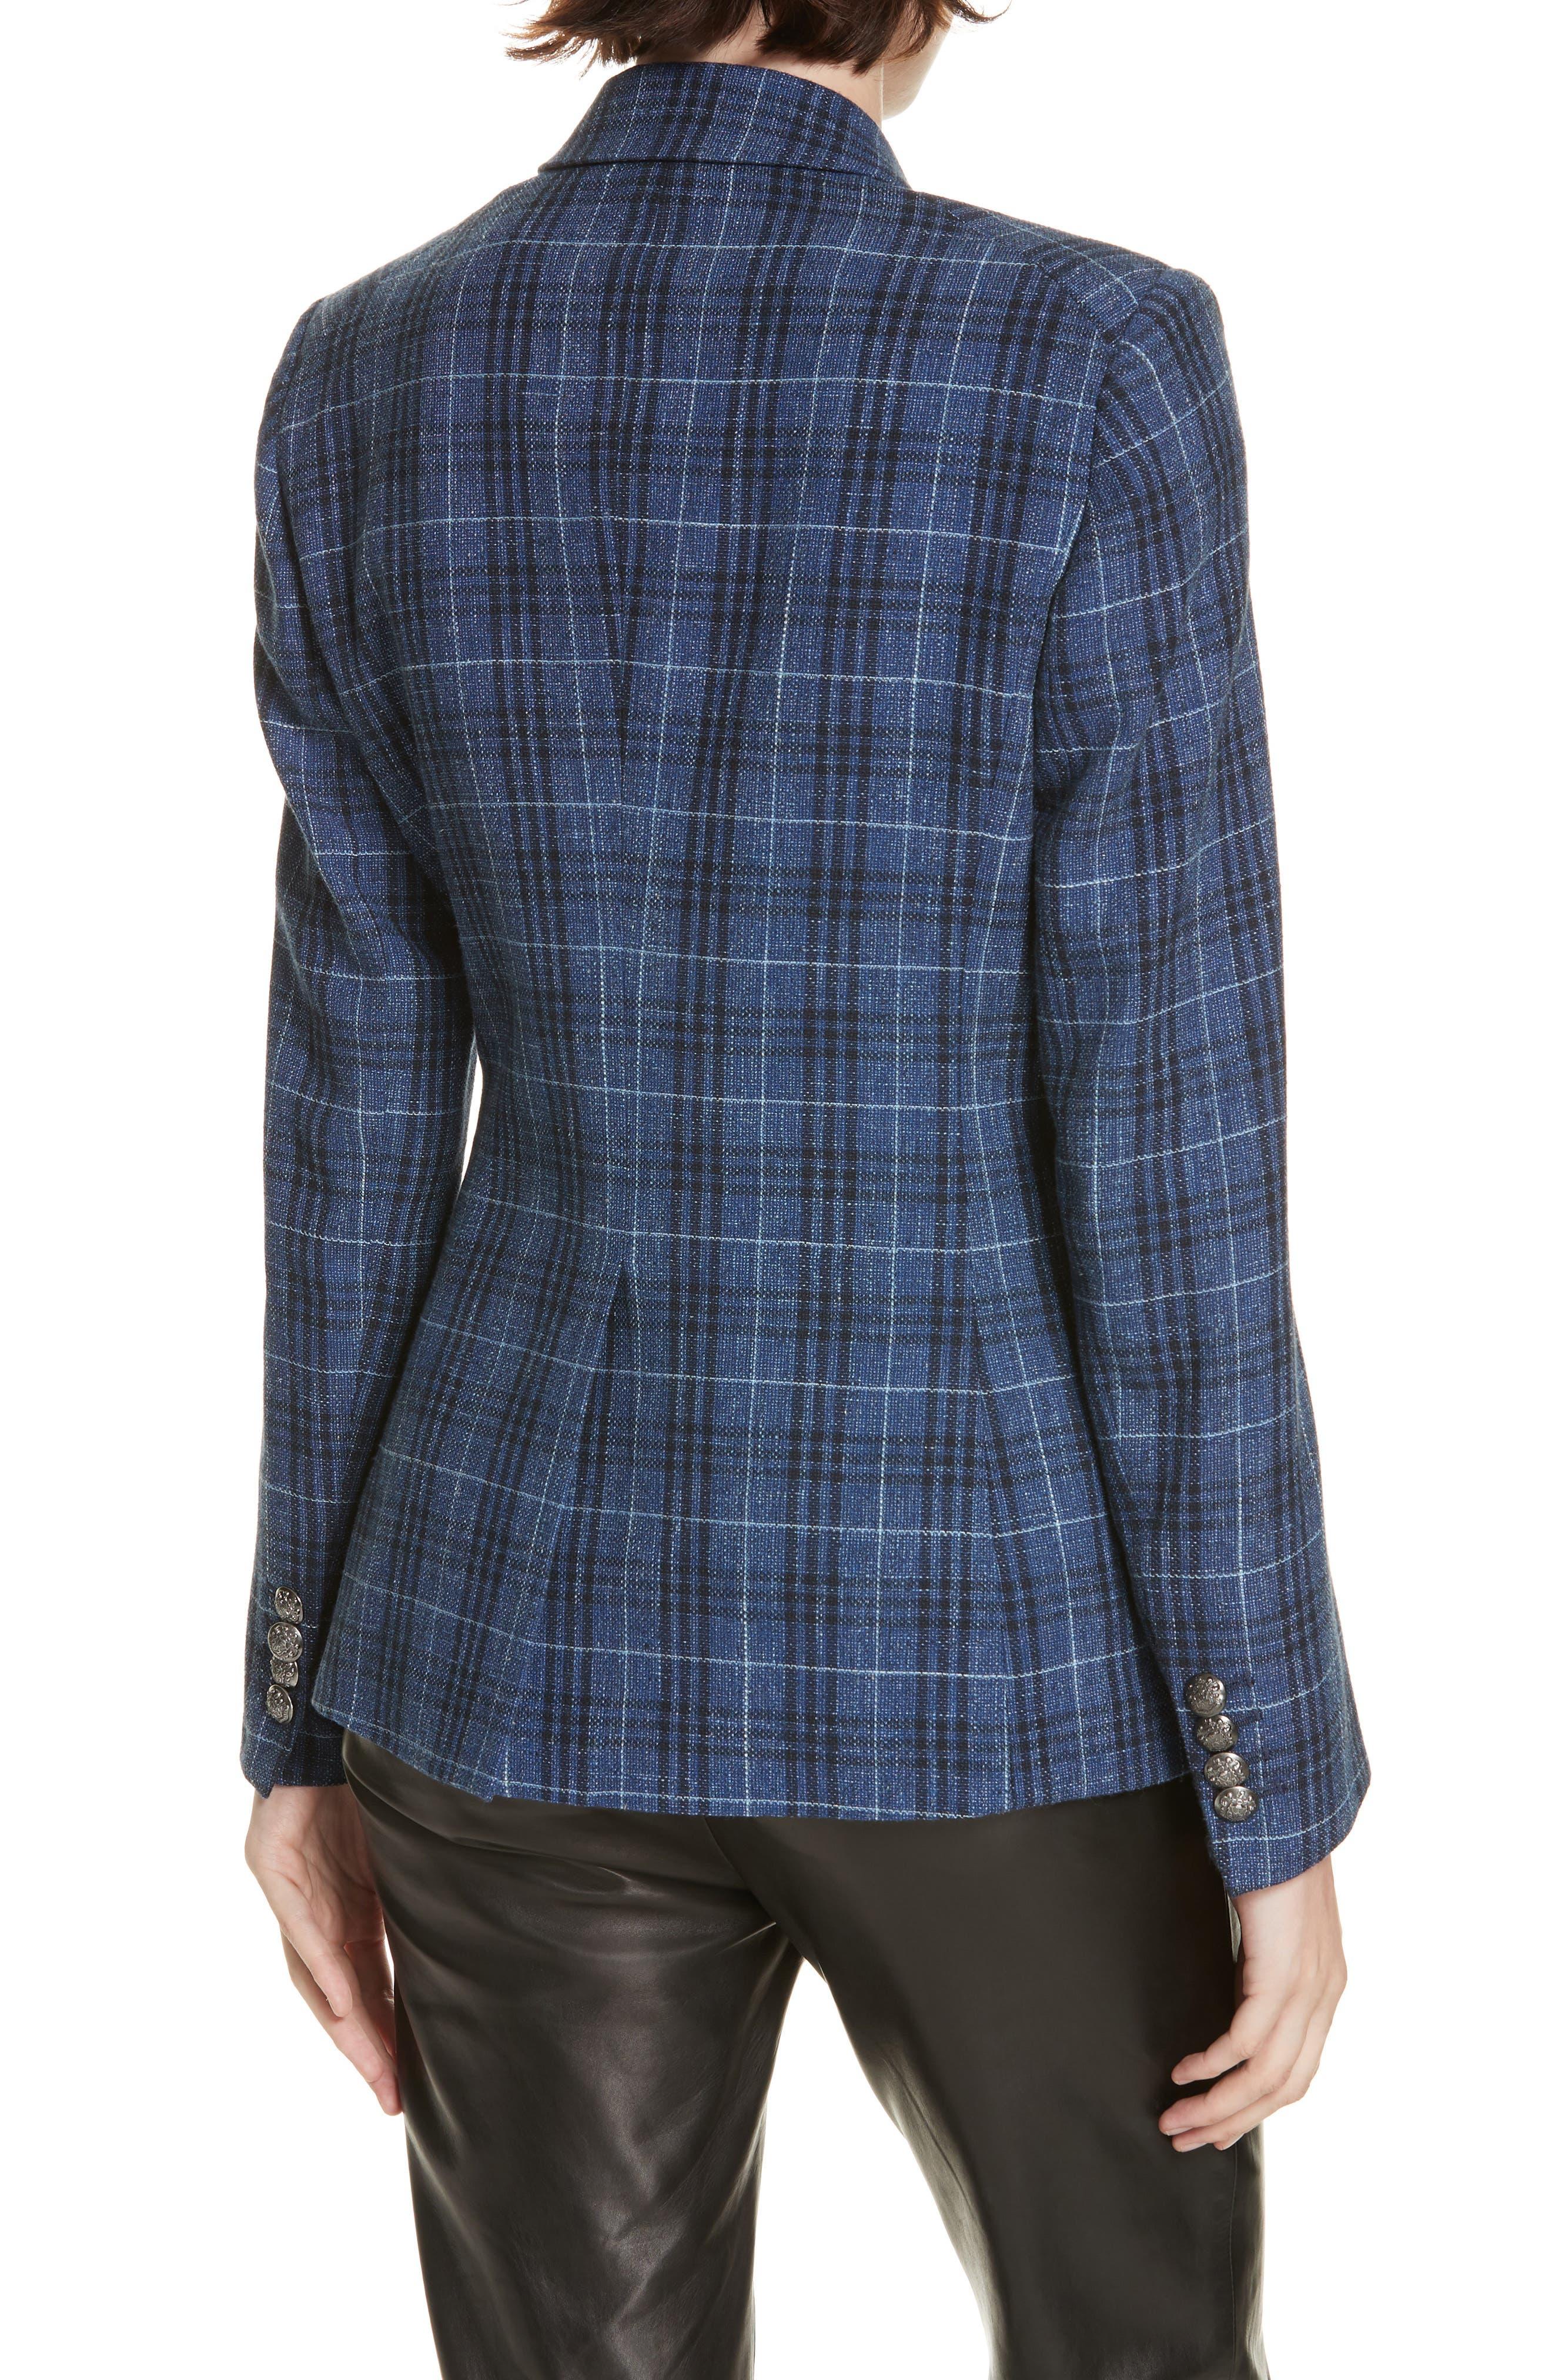 VERONICA BEARD,                             Miller Wool Blend Plaid Dickey Jacket,                             Alternate thumbnail 3, color,                             BLUE